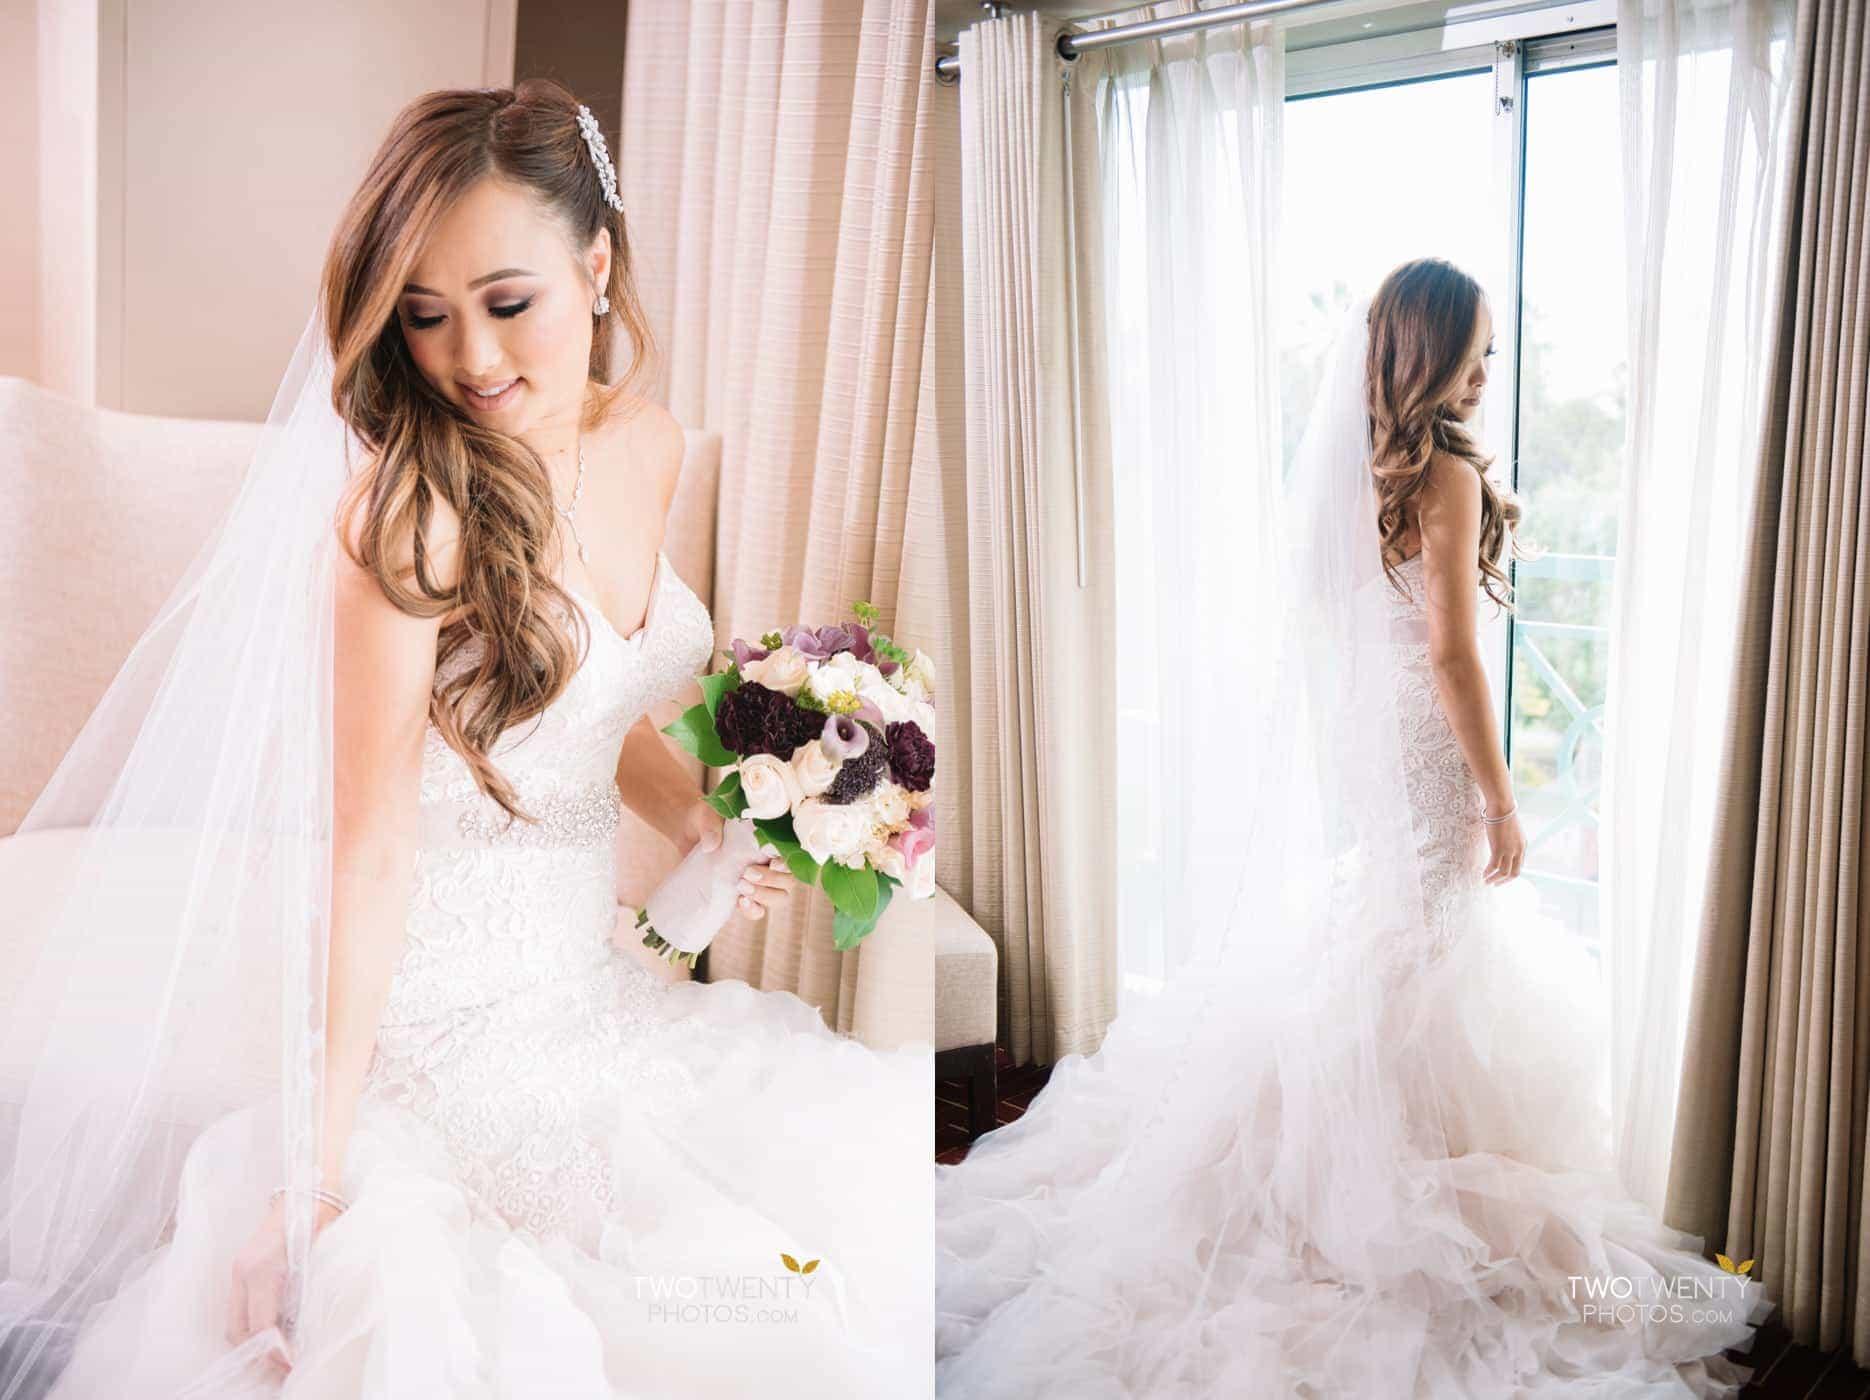 hyatt-regency-downtown-sacramento-wedding-photographer-27